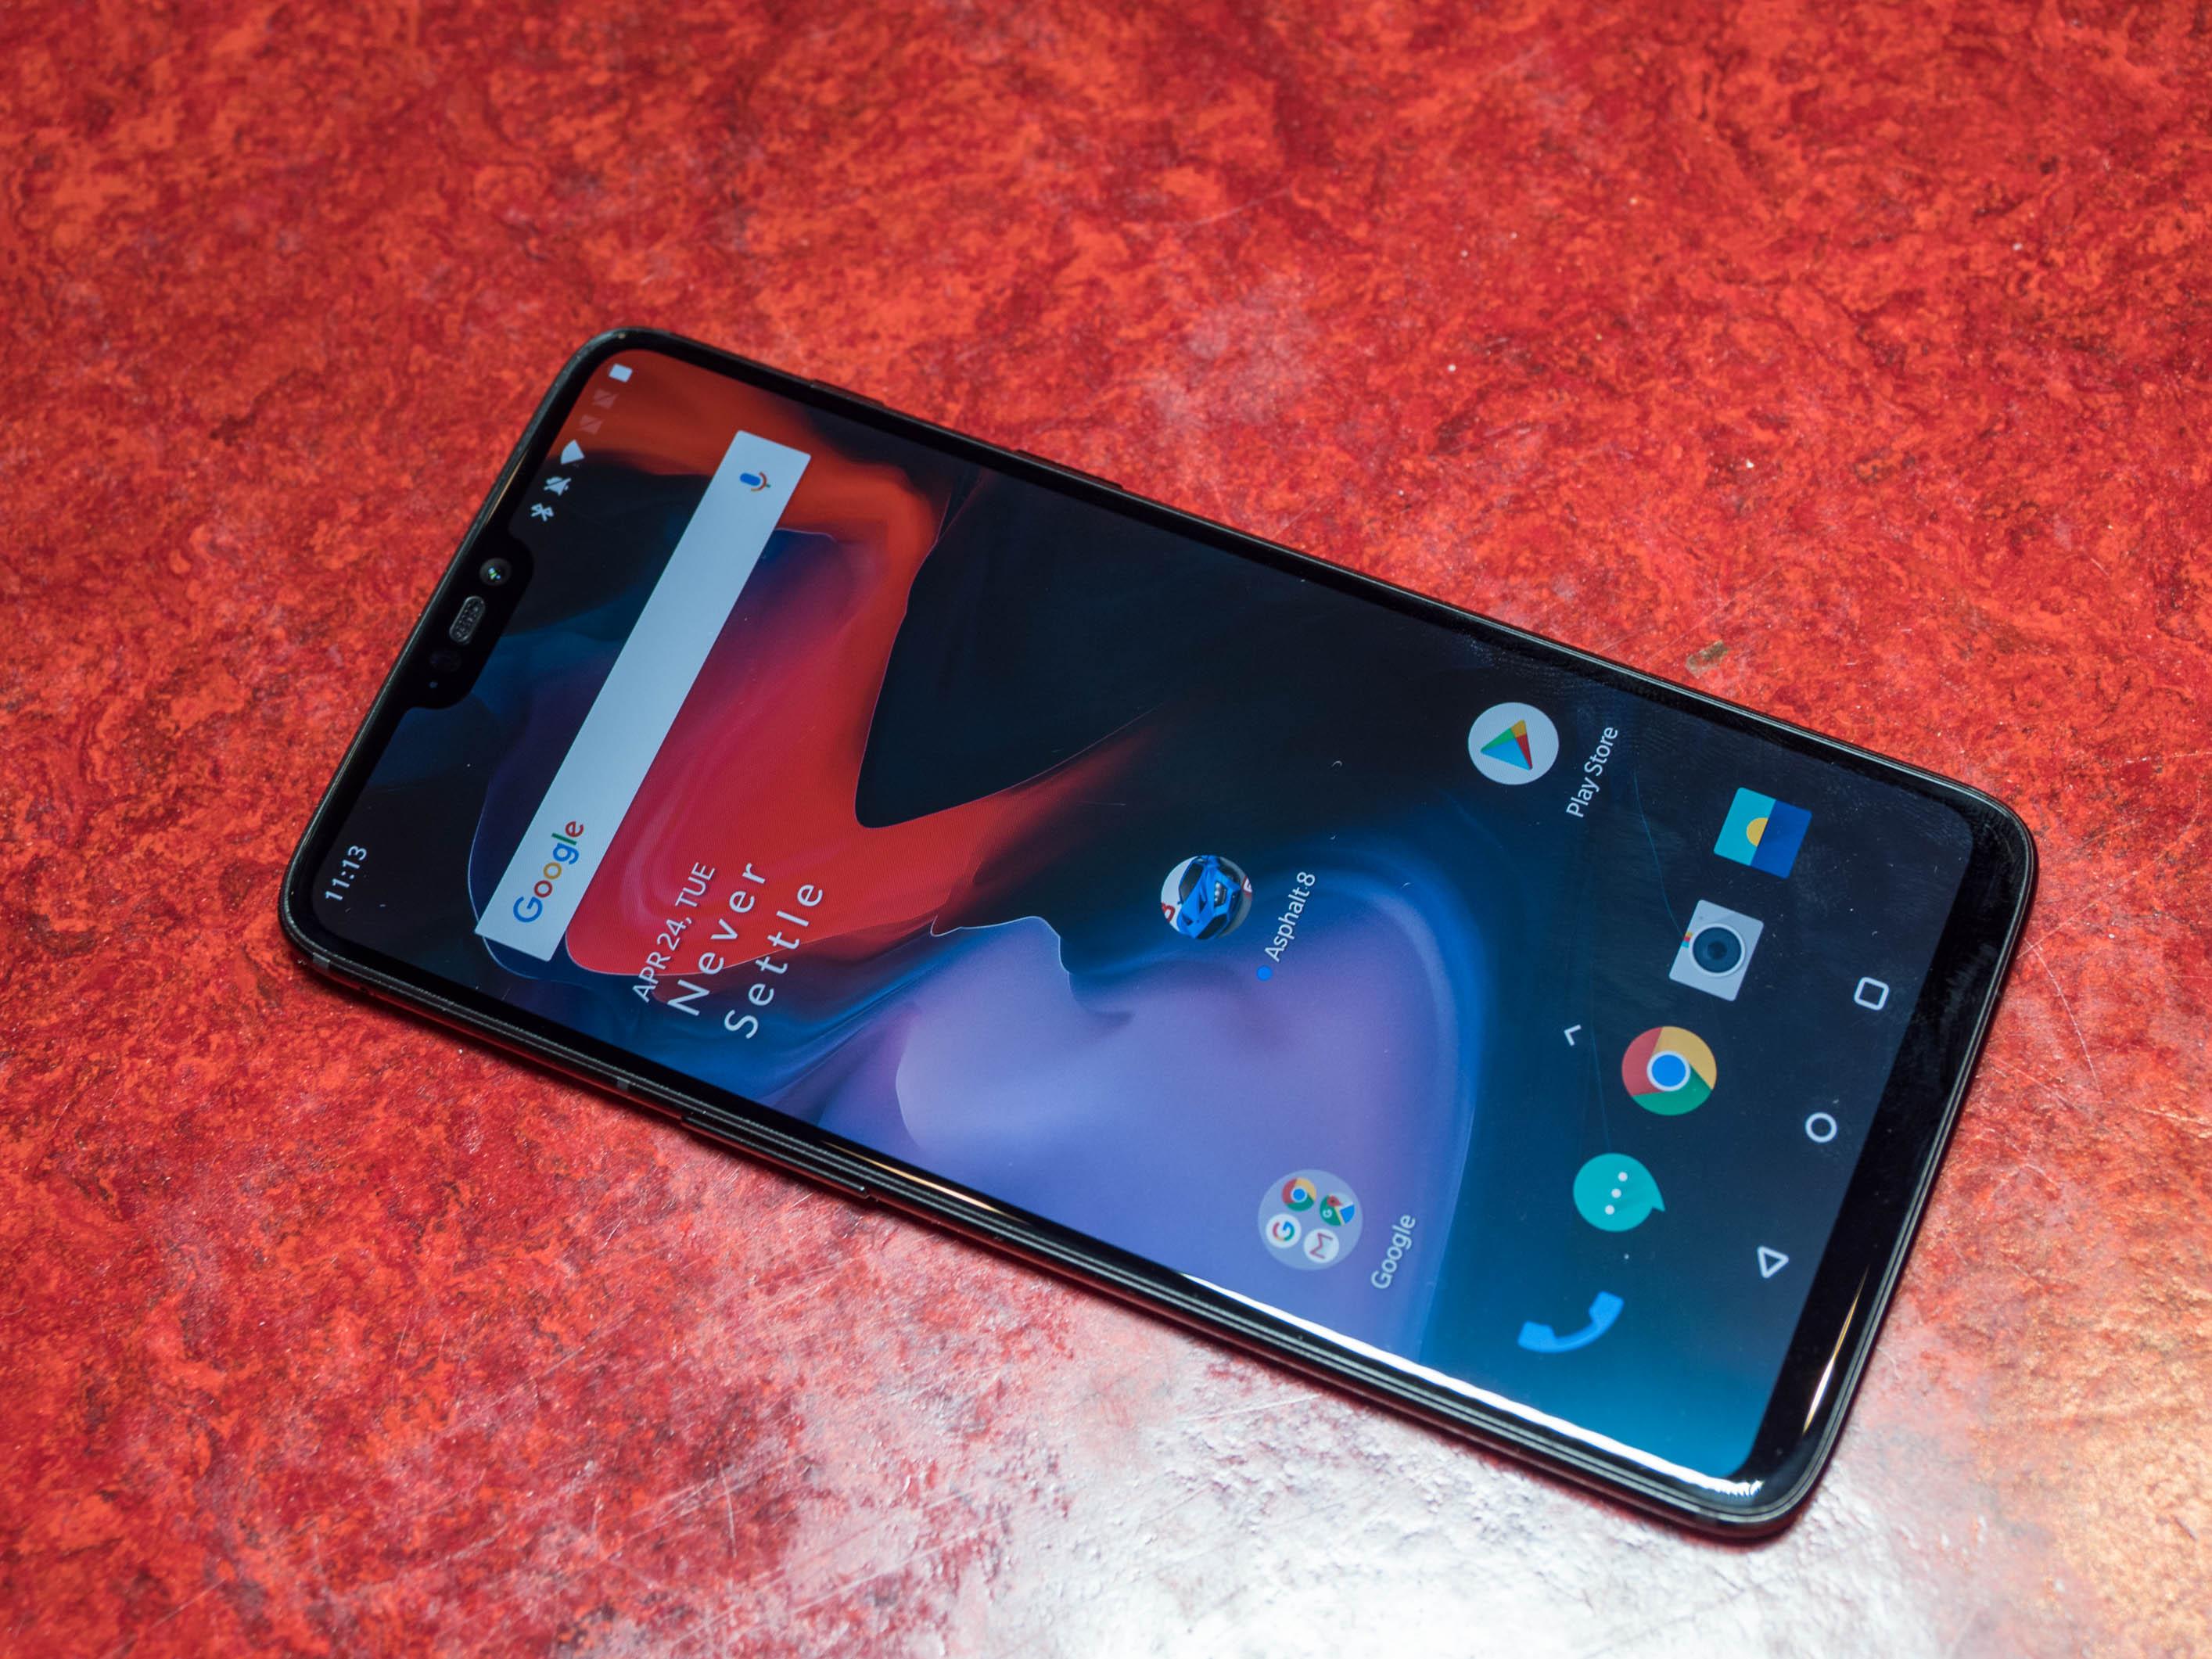 Android-Smartphone: Neues Oneplus 6 kostet ab 520 Euro -